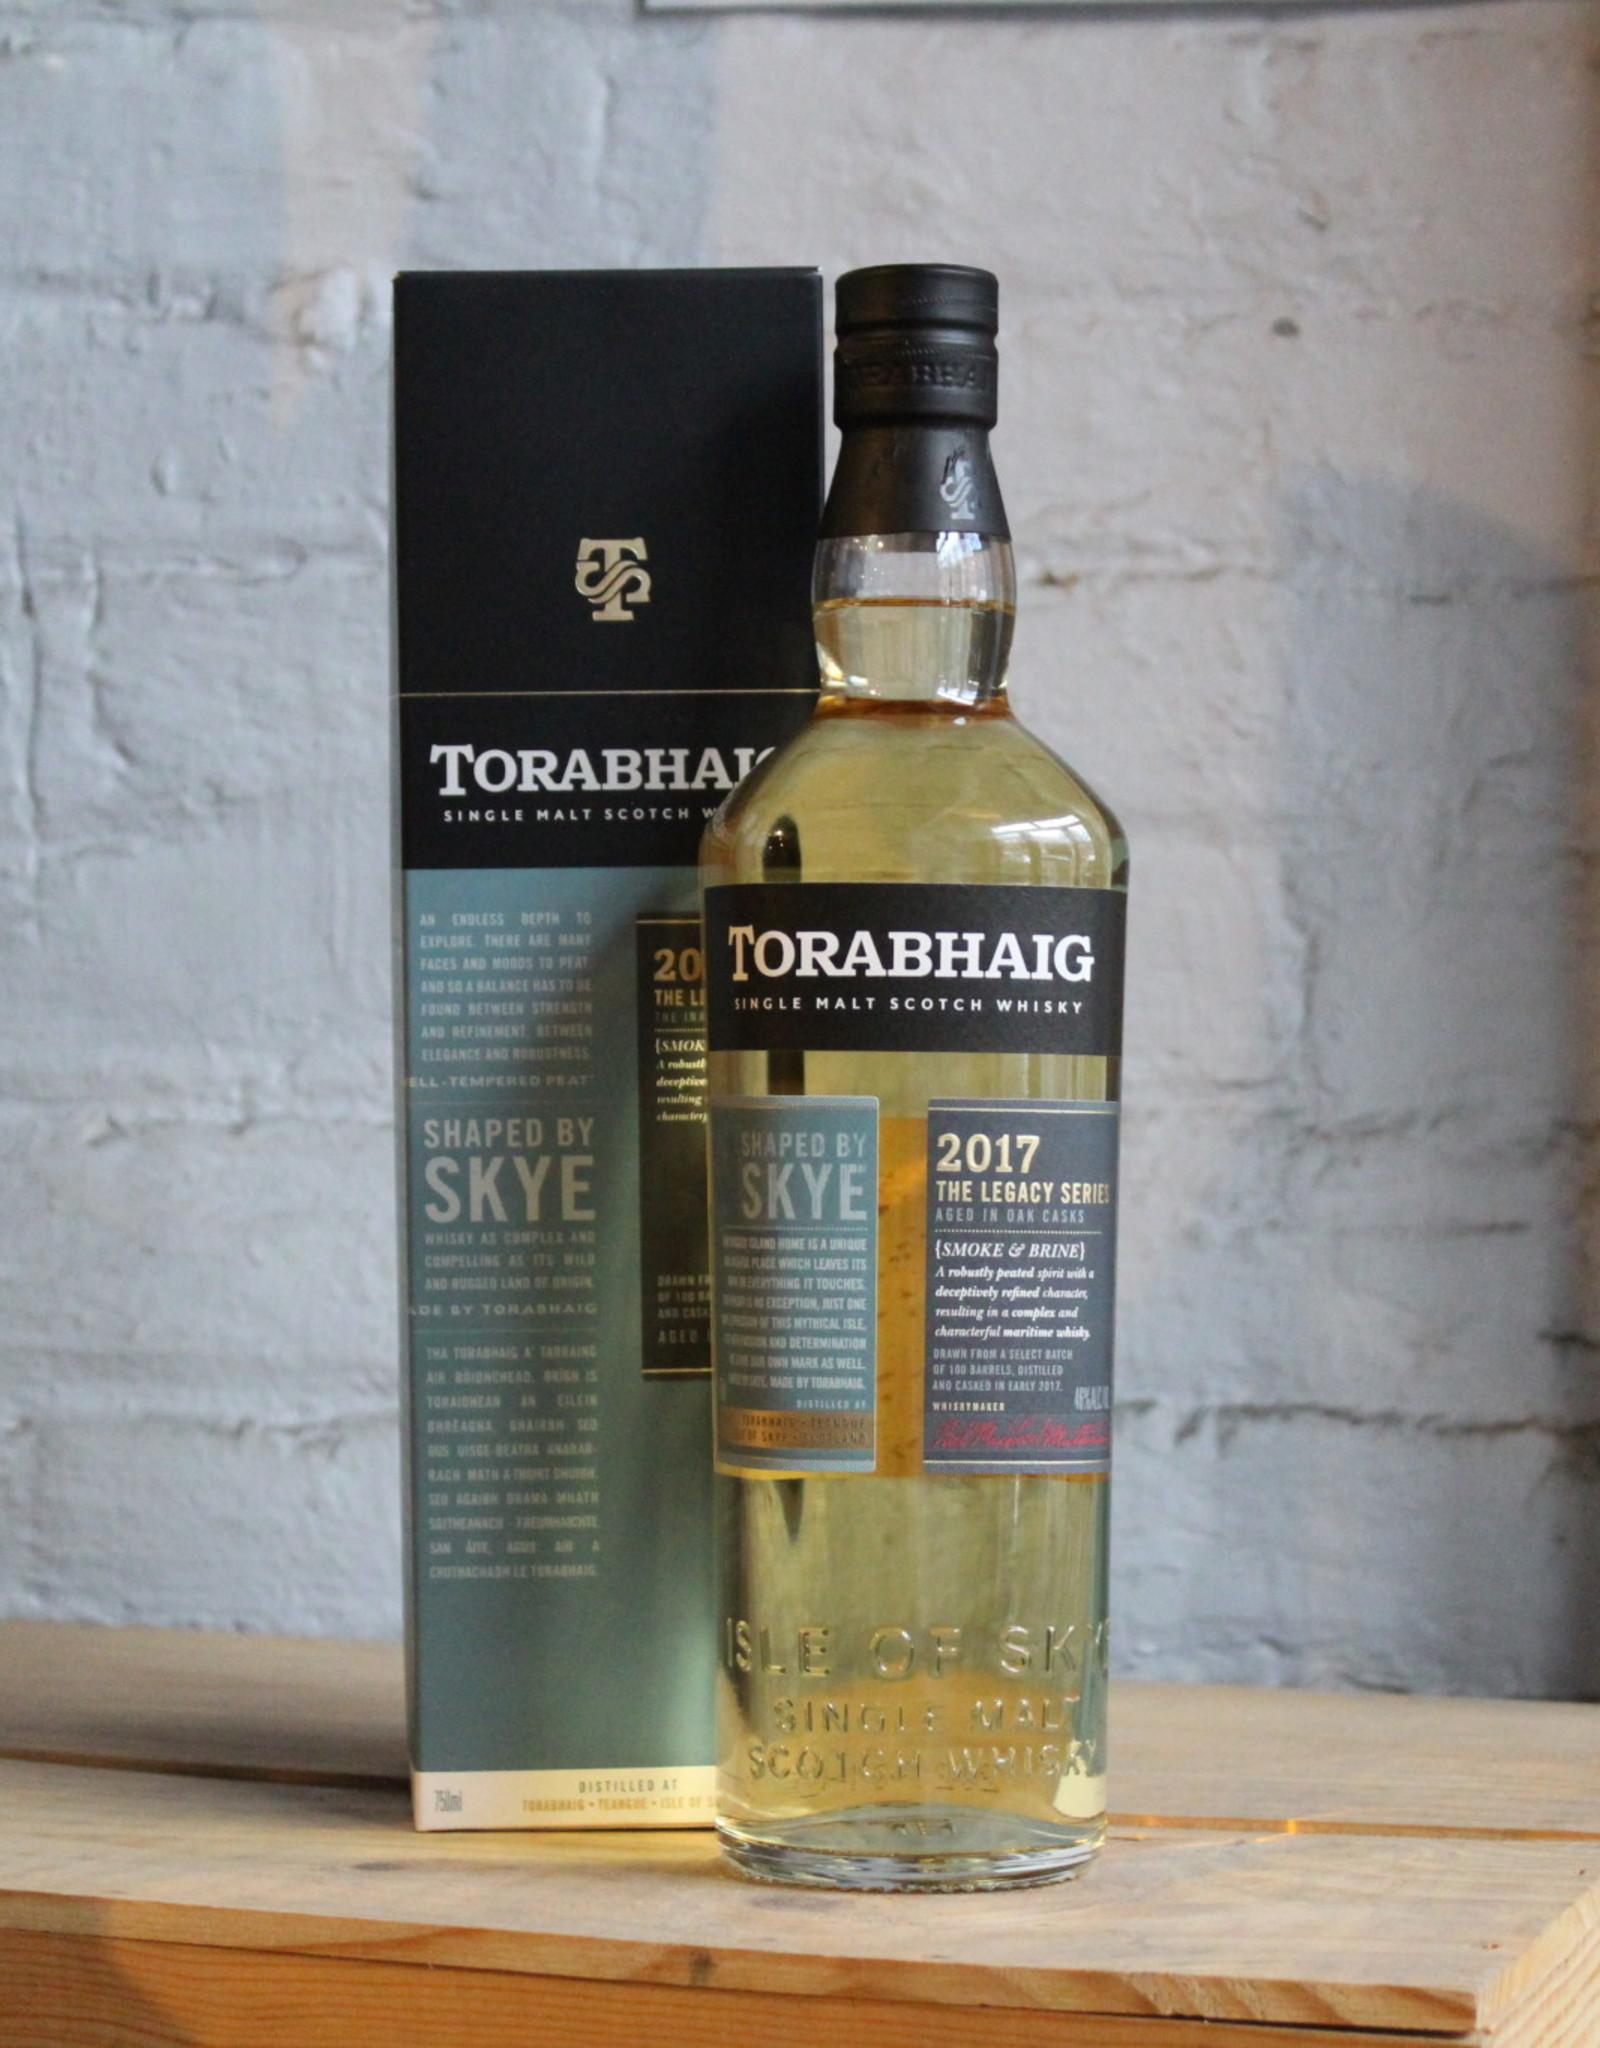 2017 Torabhaig The Legacy Series Single Malt Scotch Whisky - Isle of Skye, Scotland (750ml)